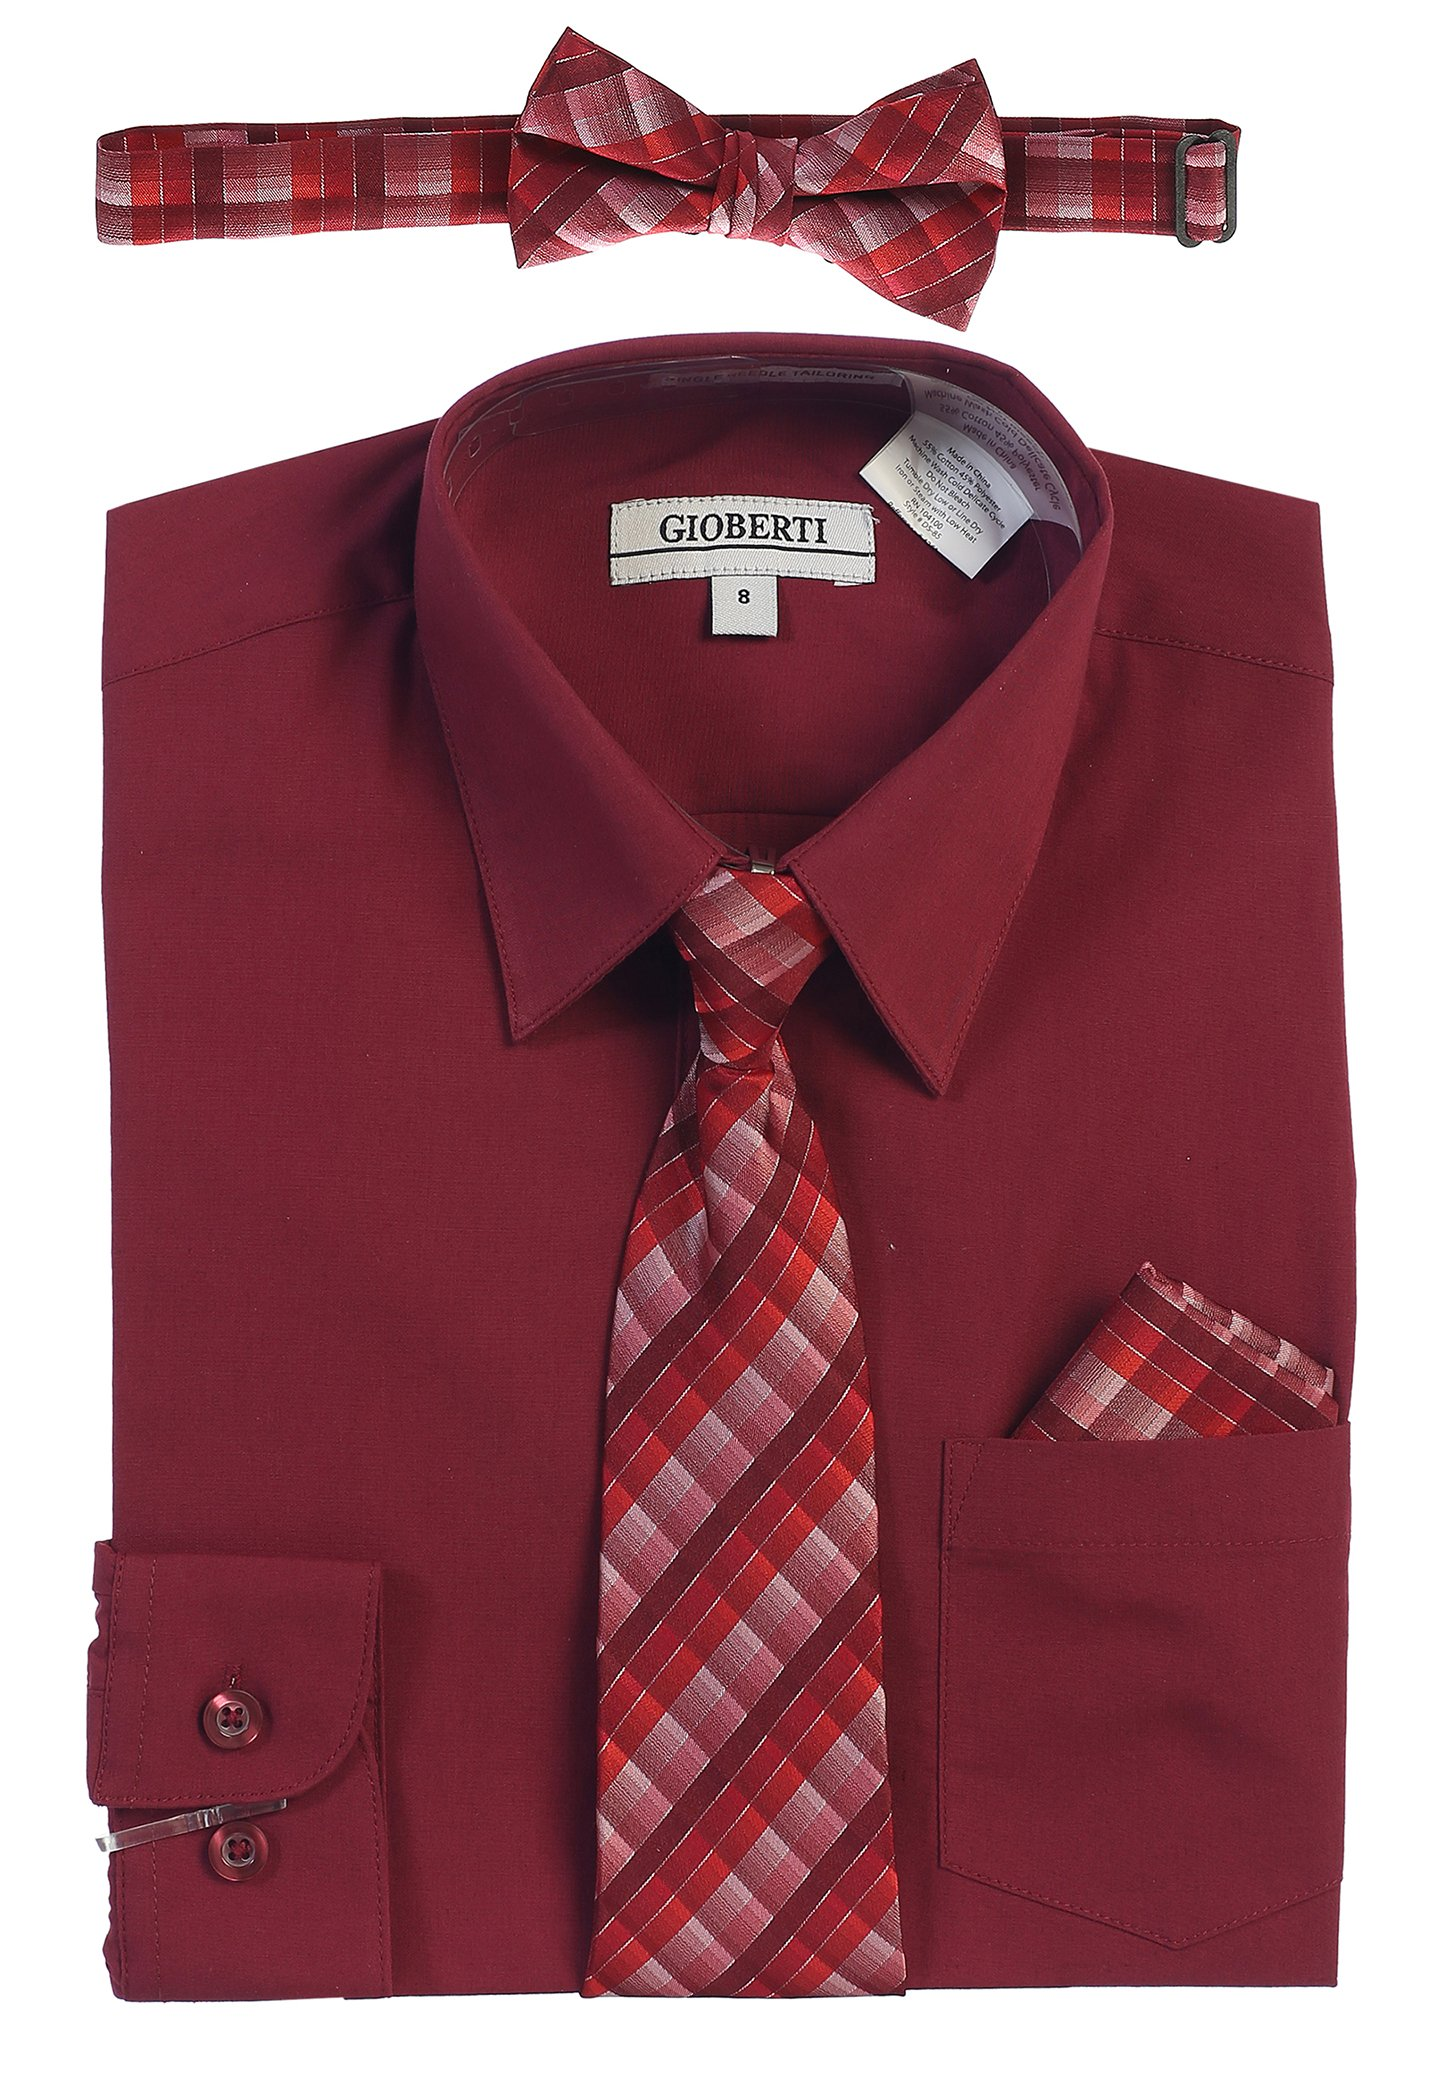 Gioberti Boy's Long Sleeve Dress Shirt and Plaid Tie Set, Burgundy, Size 5